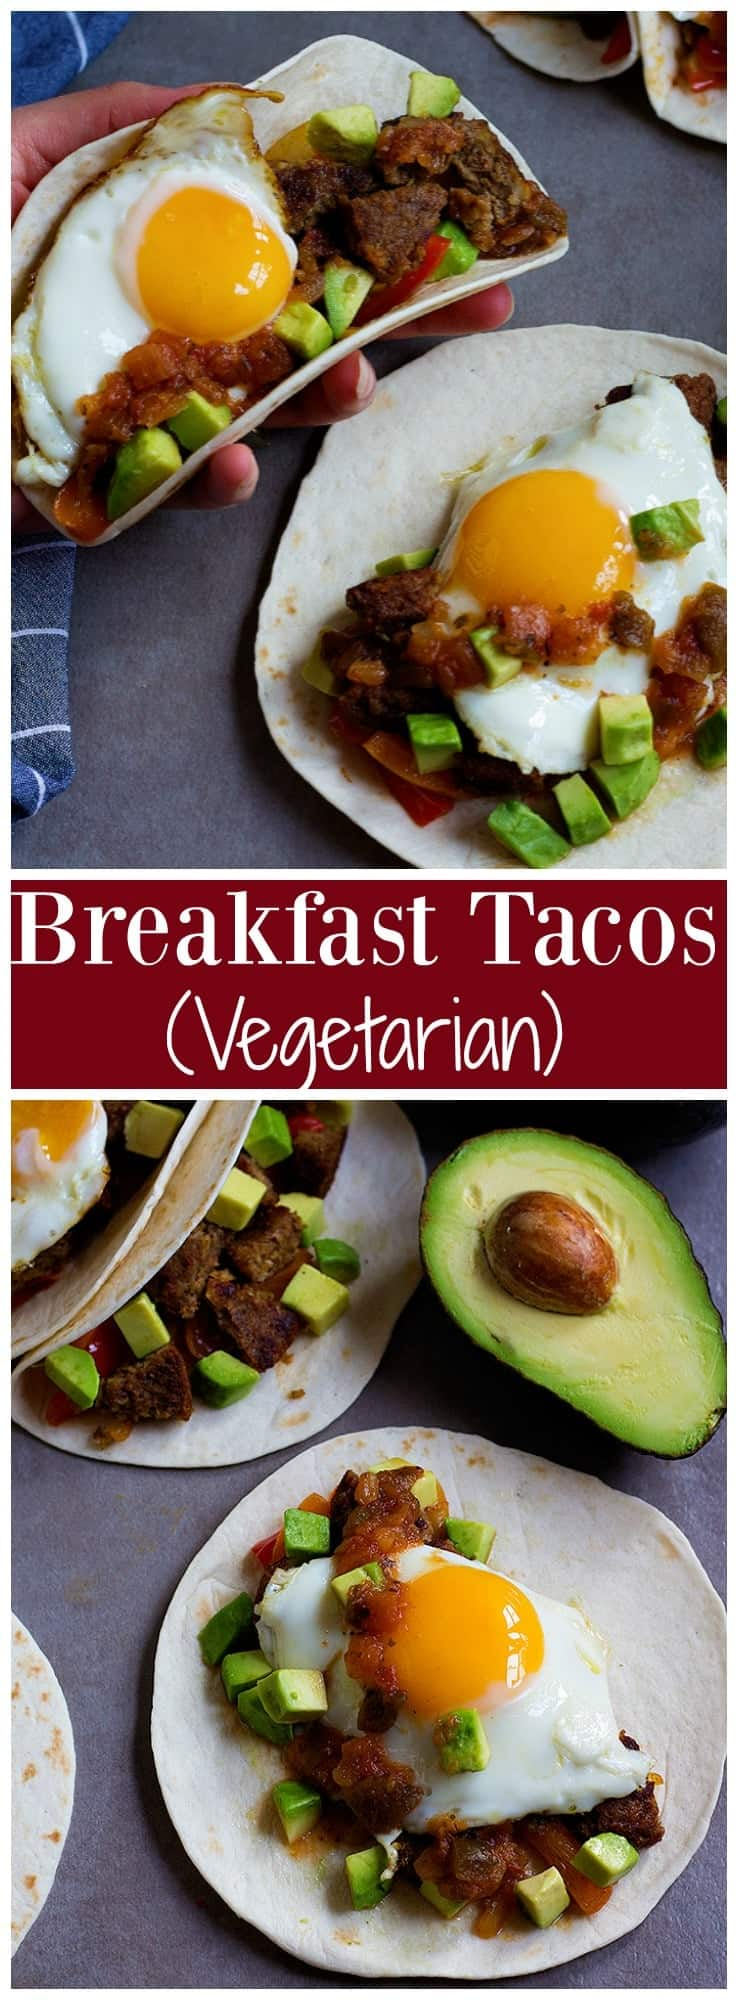 Breakfast Tacos Recipe   Breakfast Tacos Healthy   Breakfast Tacos Easy   Breakfast Tacos Vegetarian